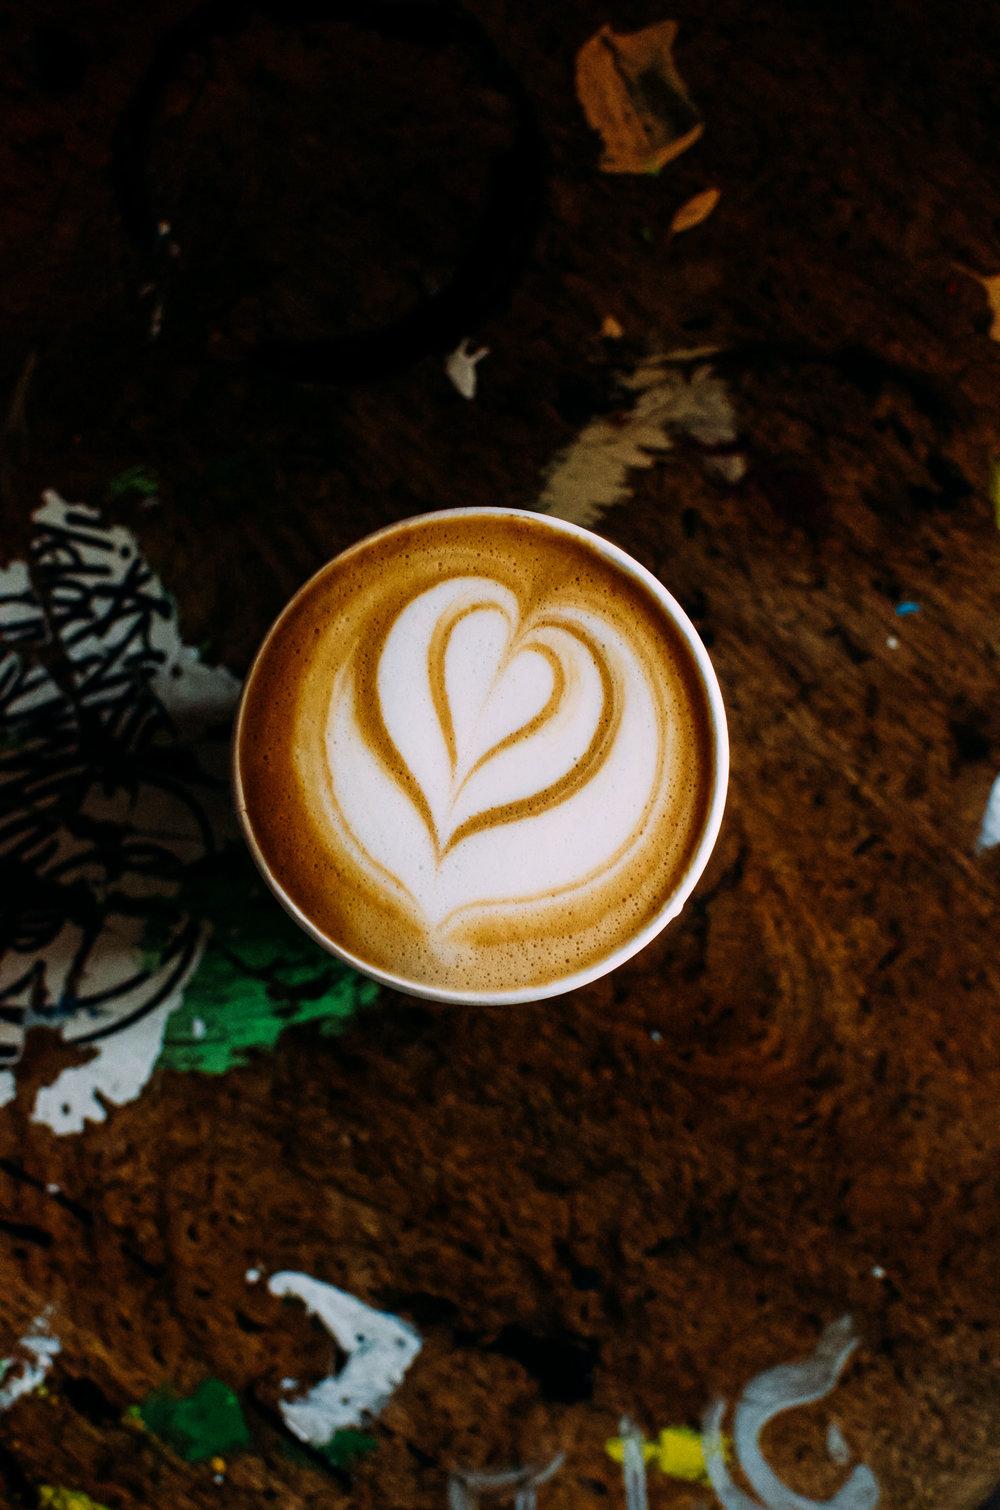 Wendling_Boyd_Coffee_Guide_Astro_Coffee_Detroit-10.jpg